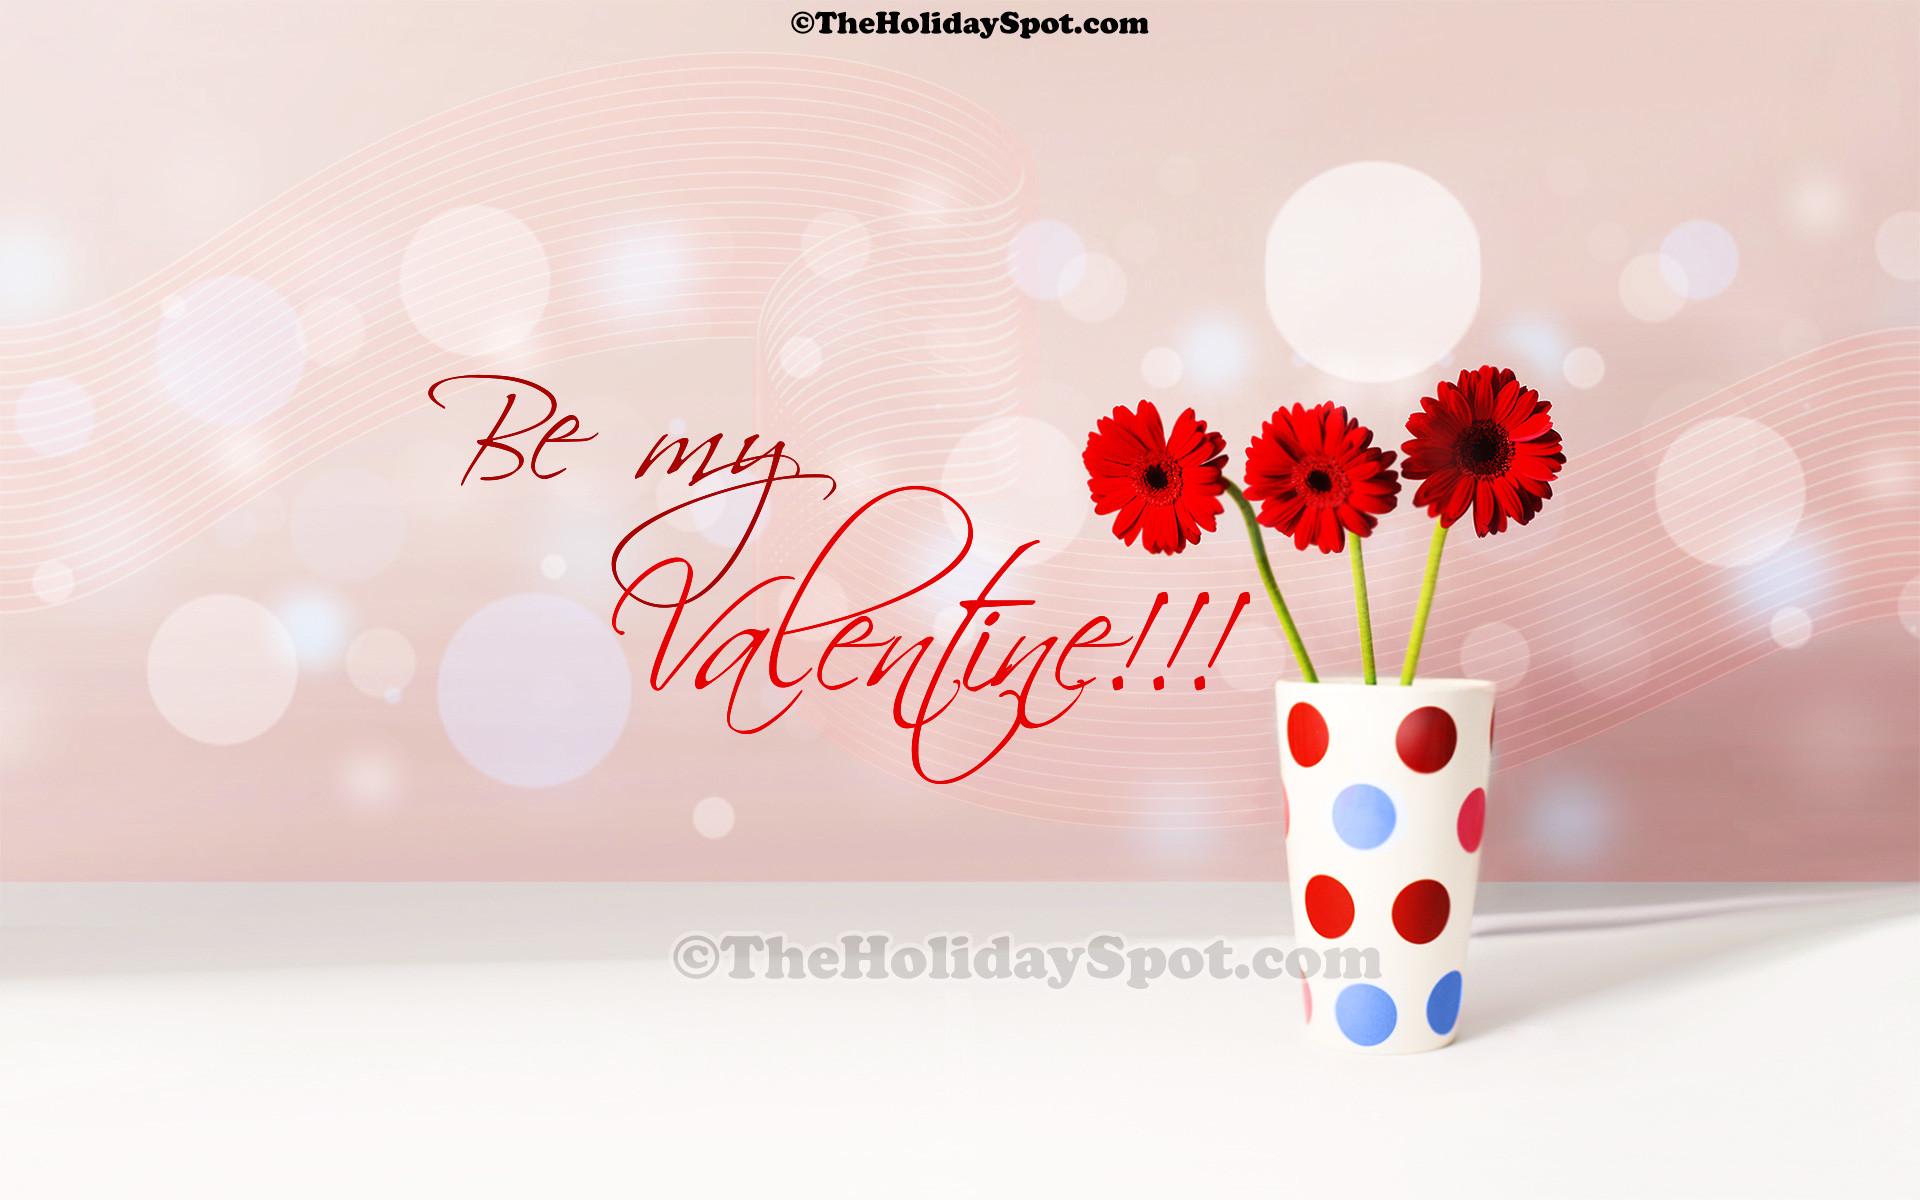 Valentine Wallpaper – Be my Valenine